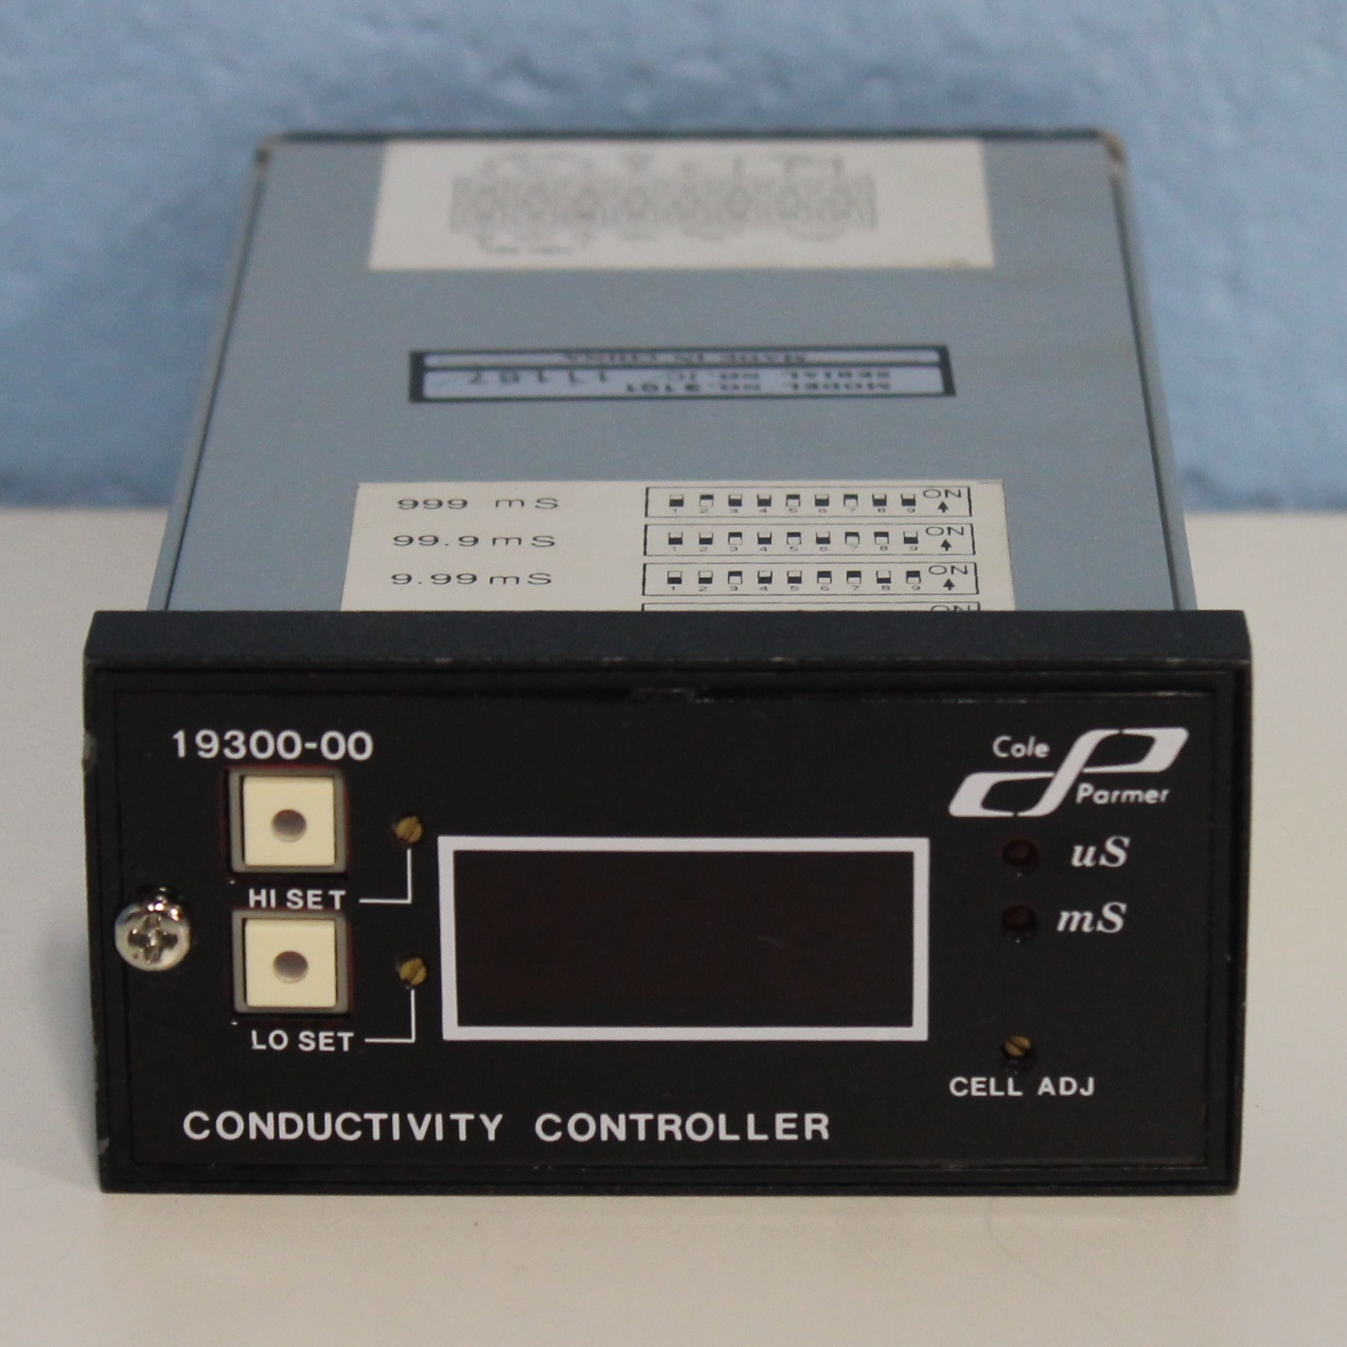 19300-00 Conductivity Controller Model 3101